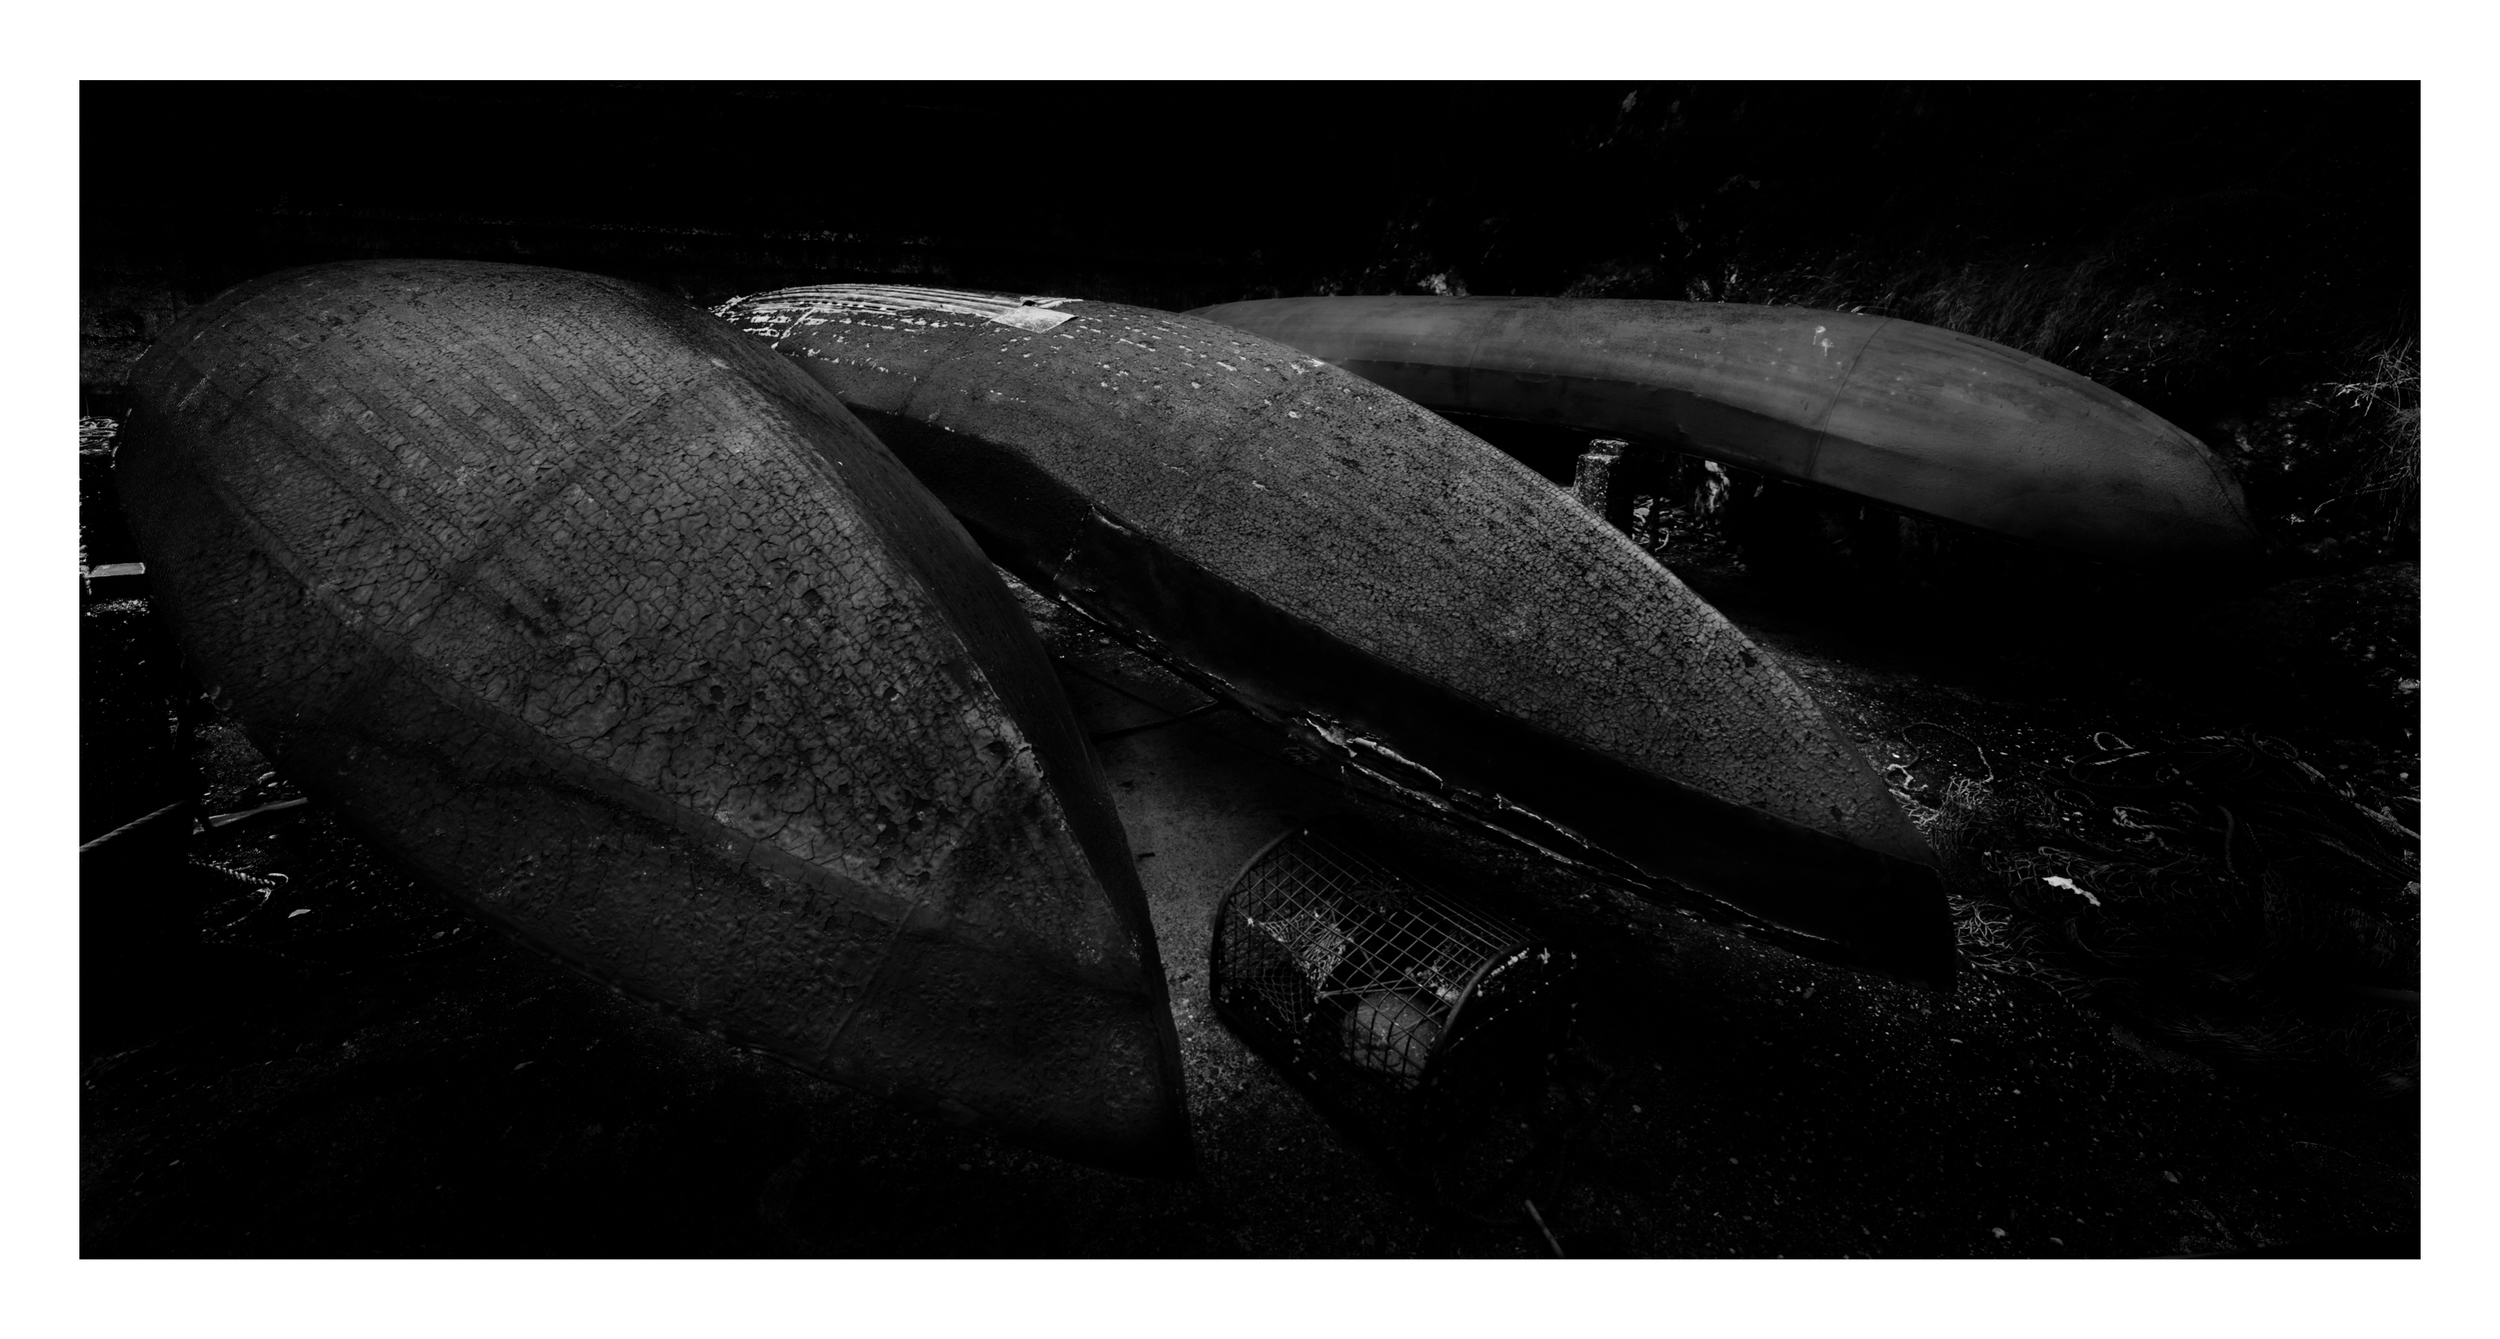 MK's Curraghs on Dunquinn pier, F11 1.6 sec exposure